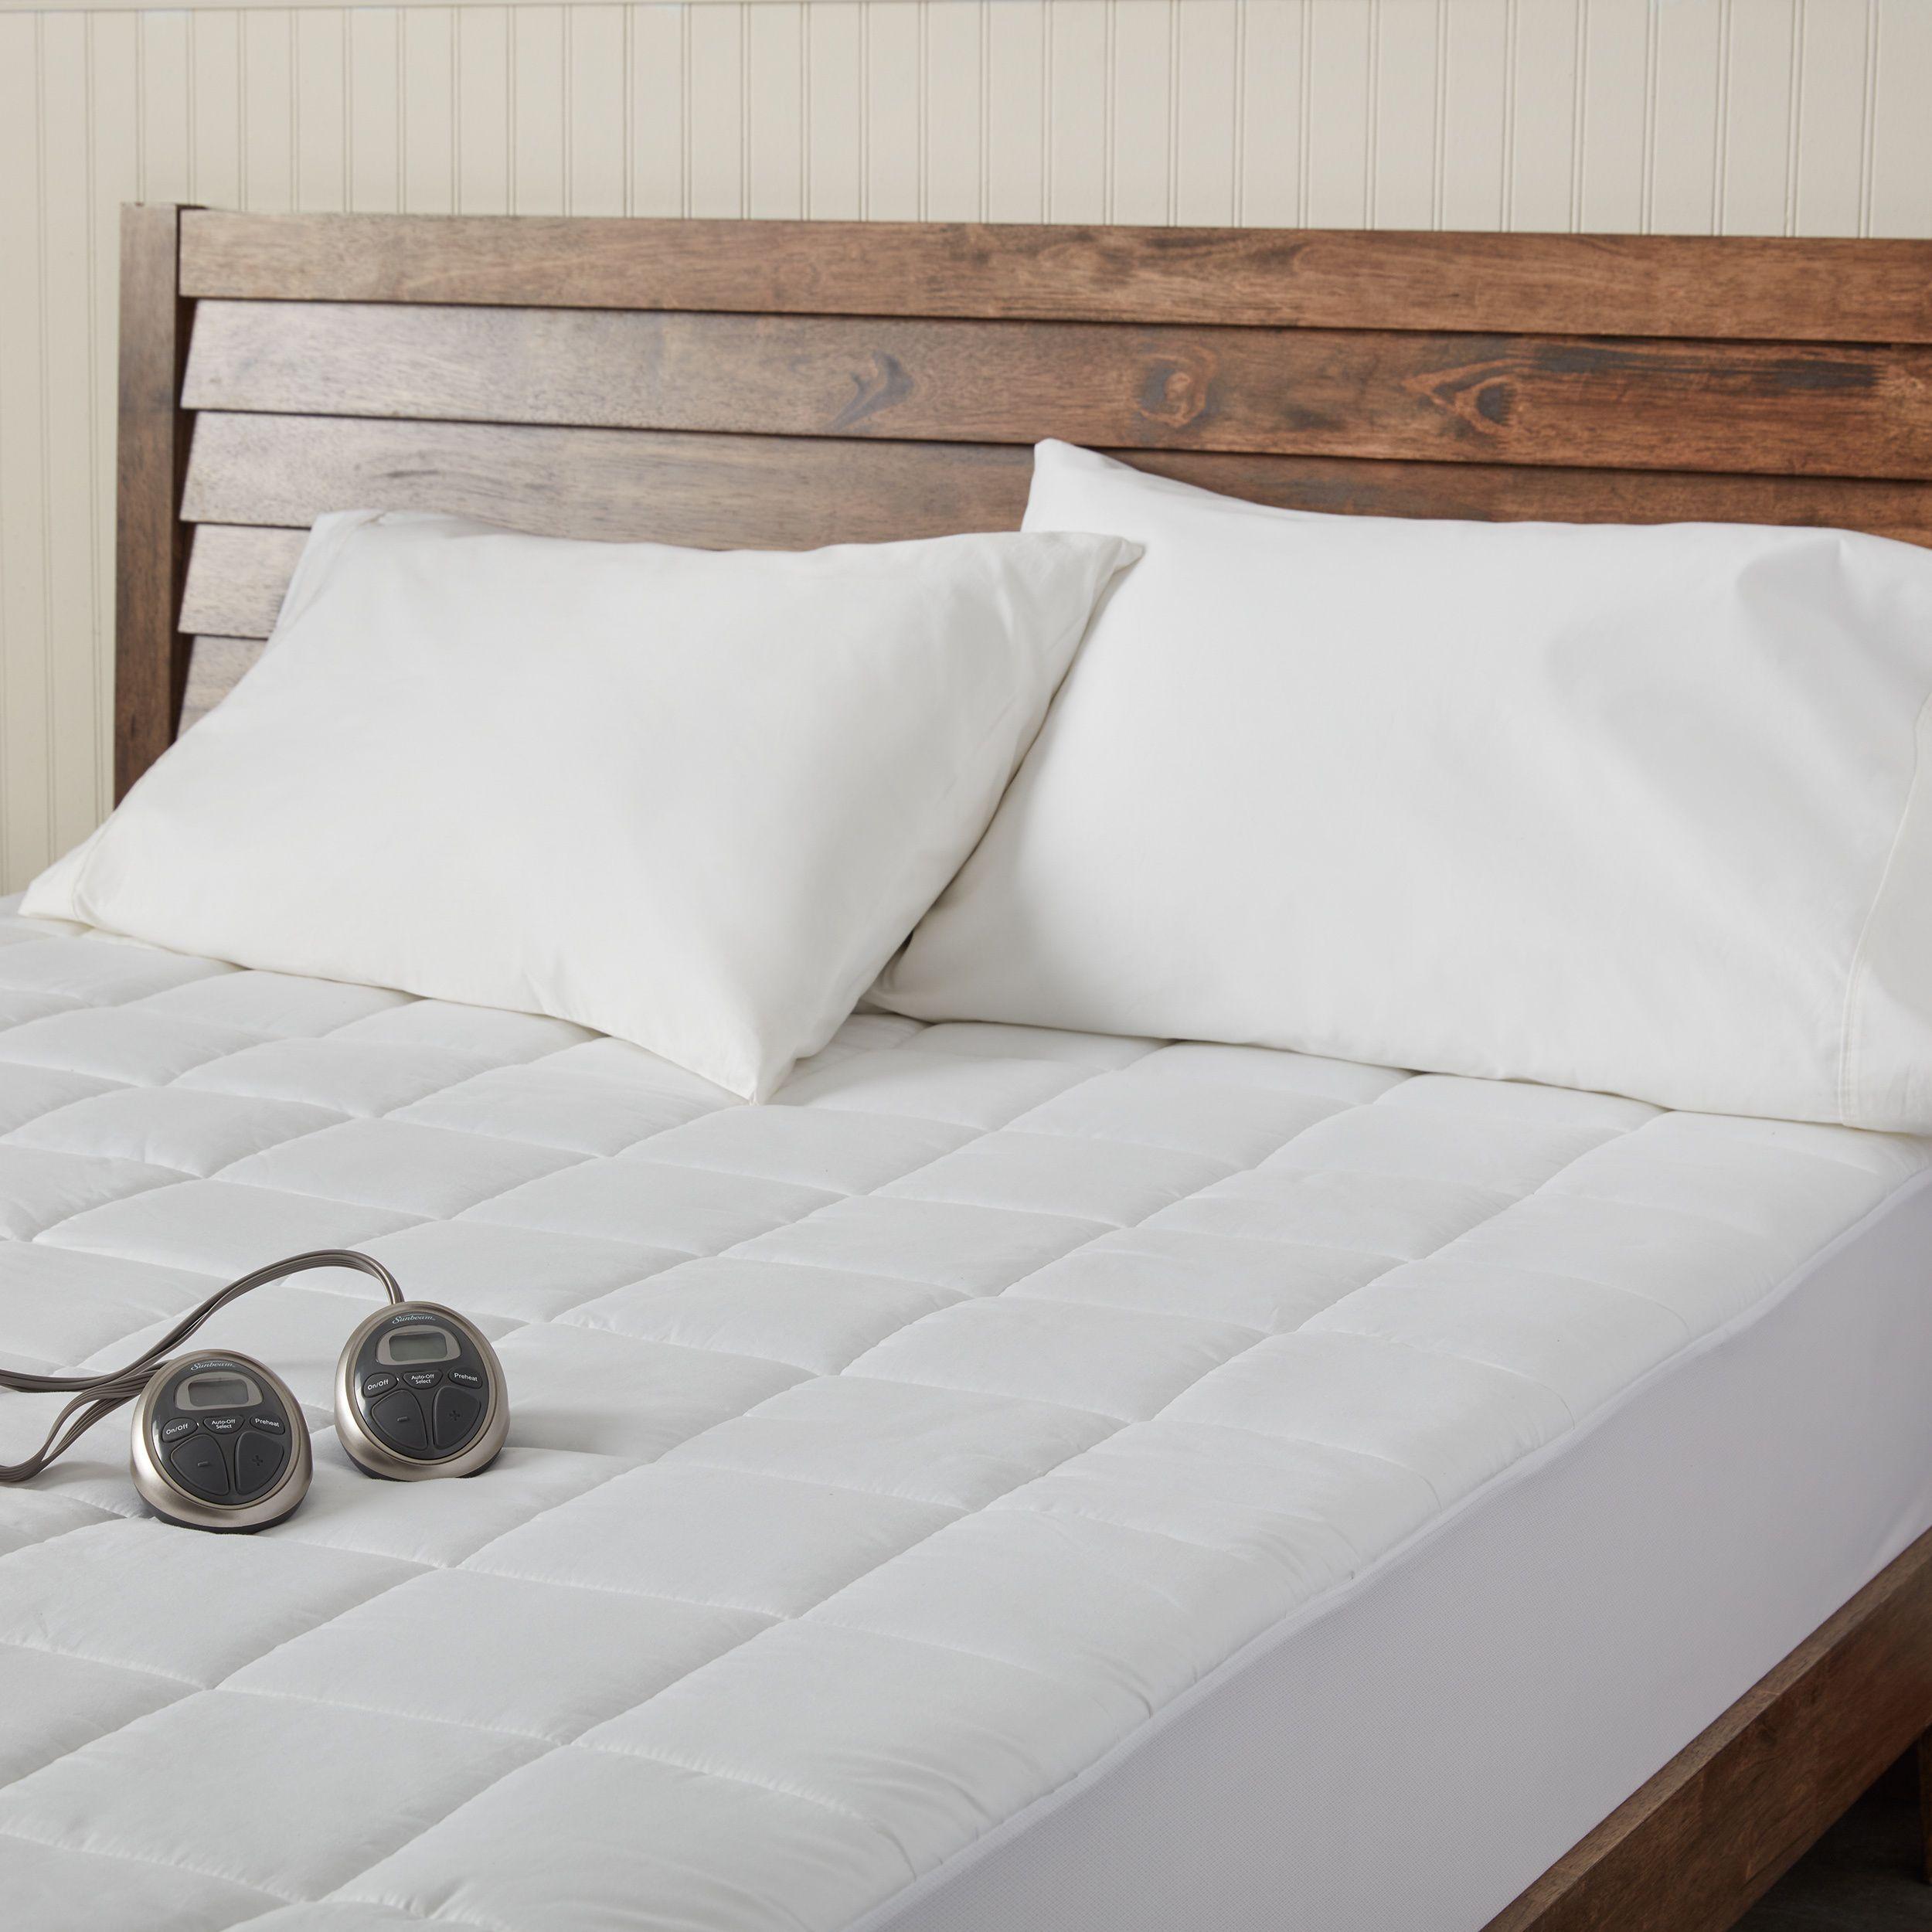 sunbeam premium heated electric queen size mattress pad white